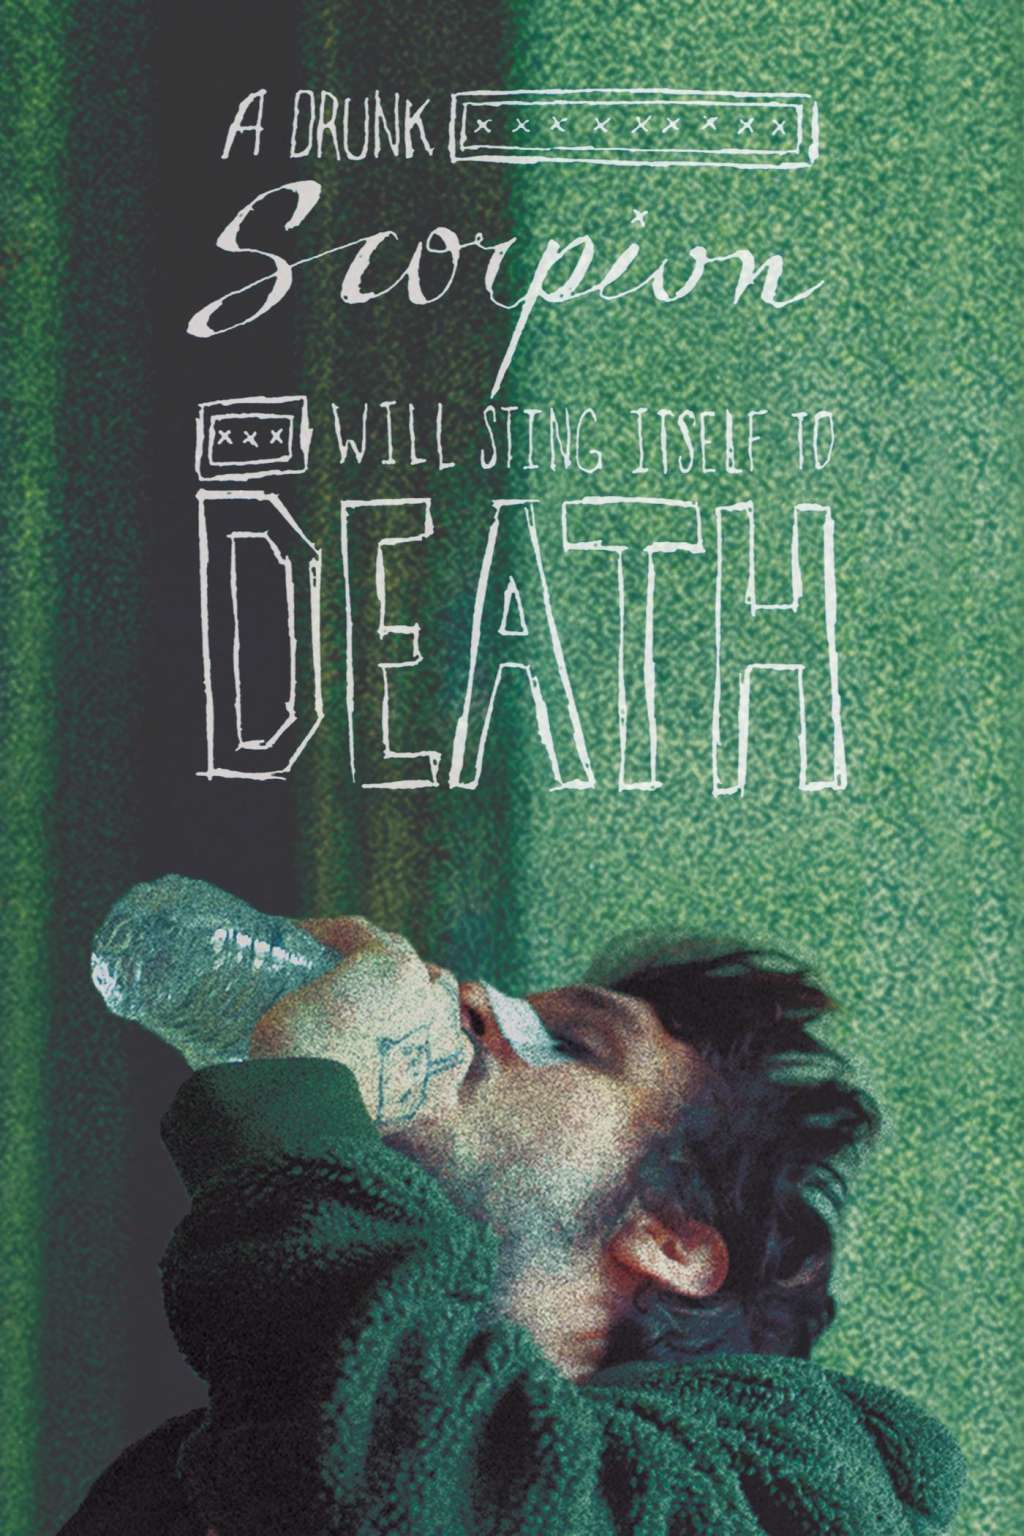 A Drunk Scorpion Will Sting Itself to Death kapak